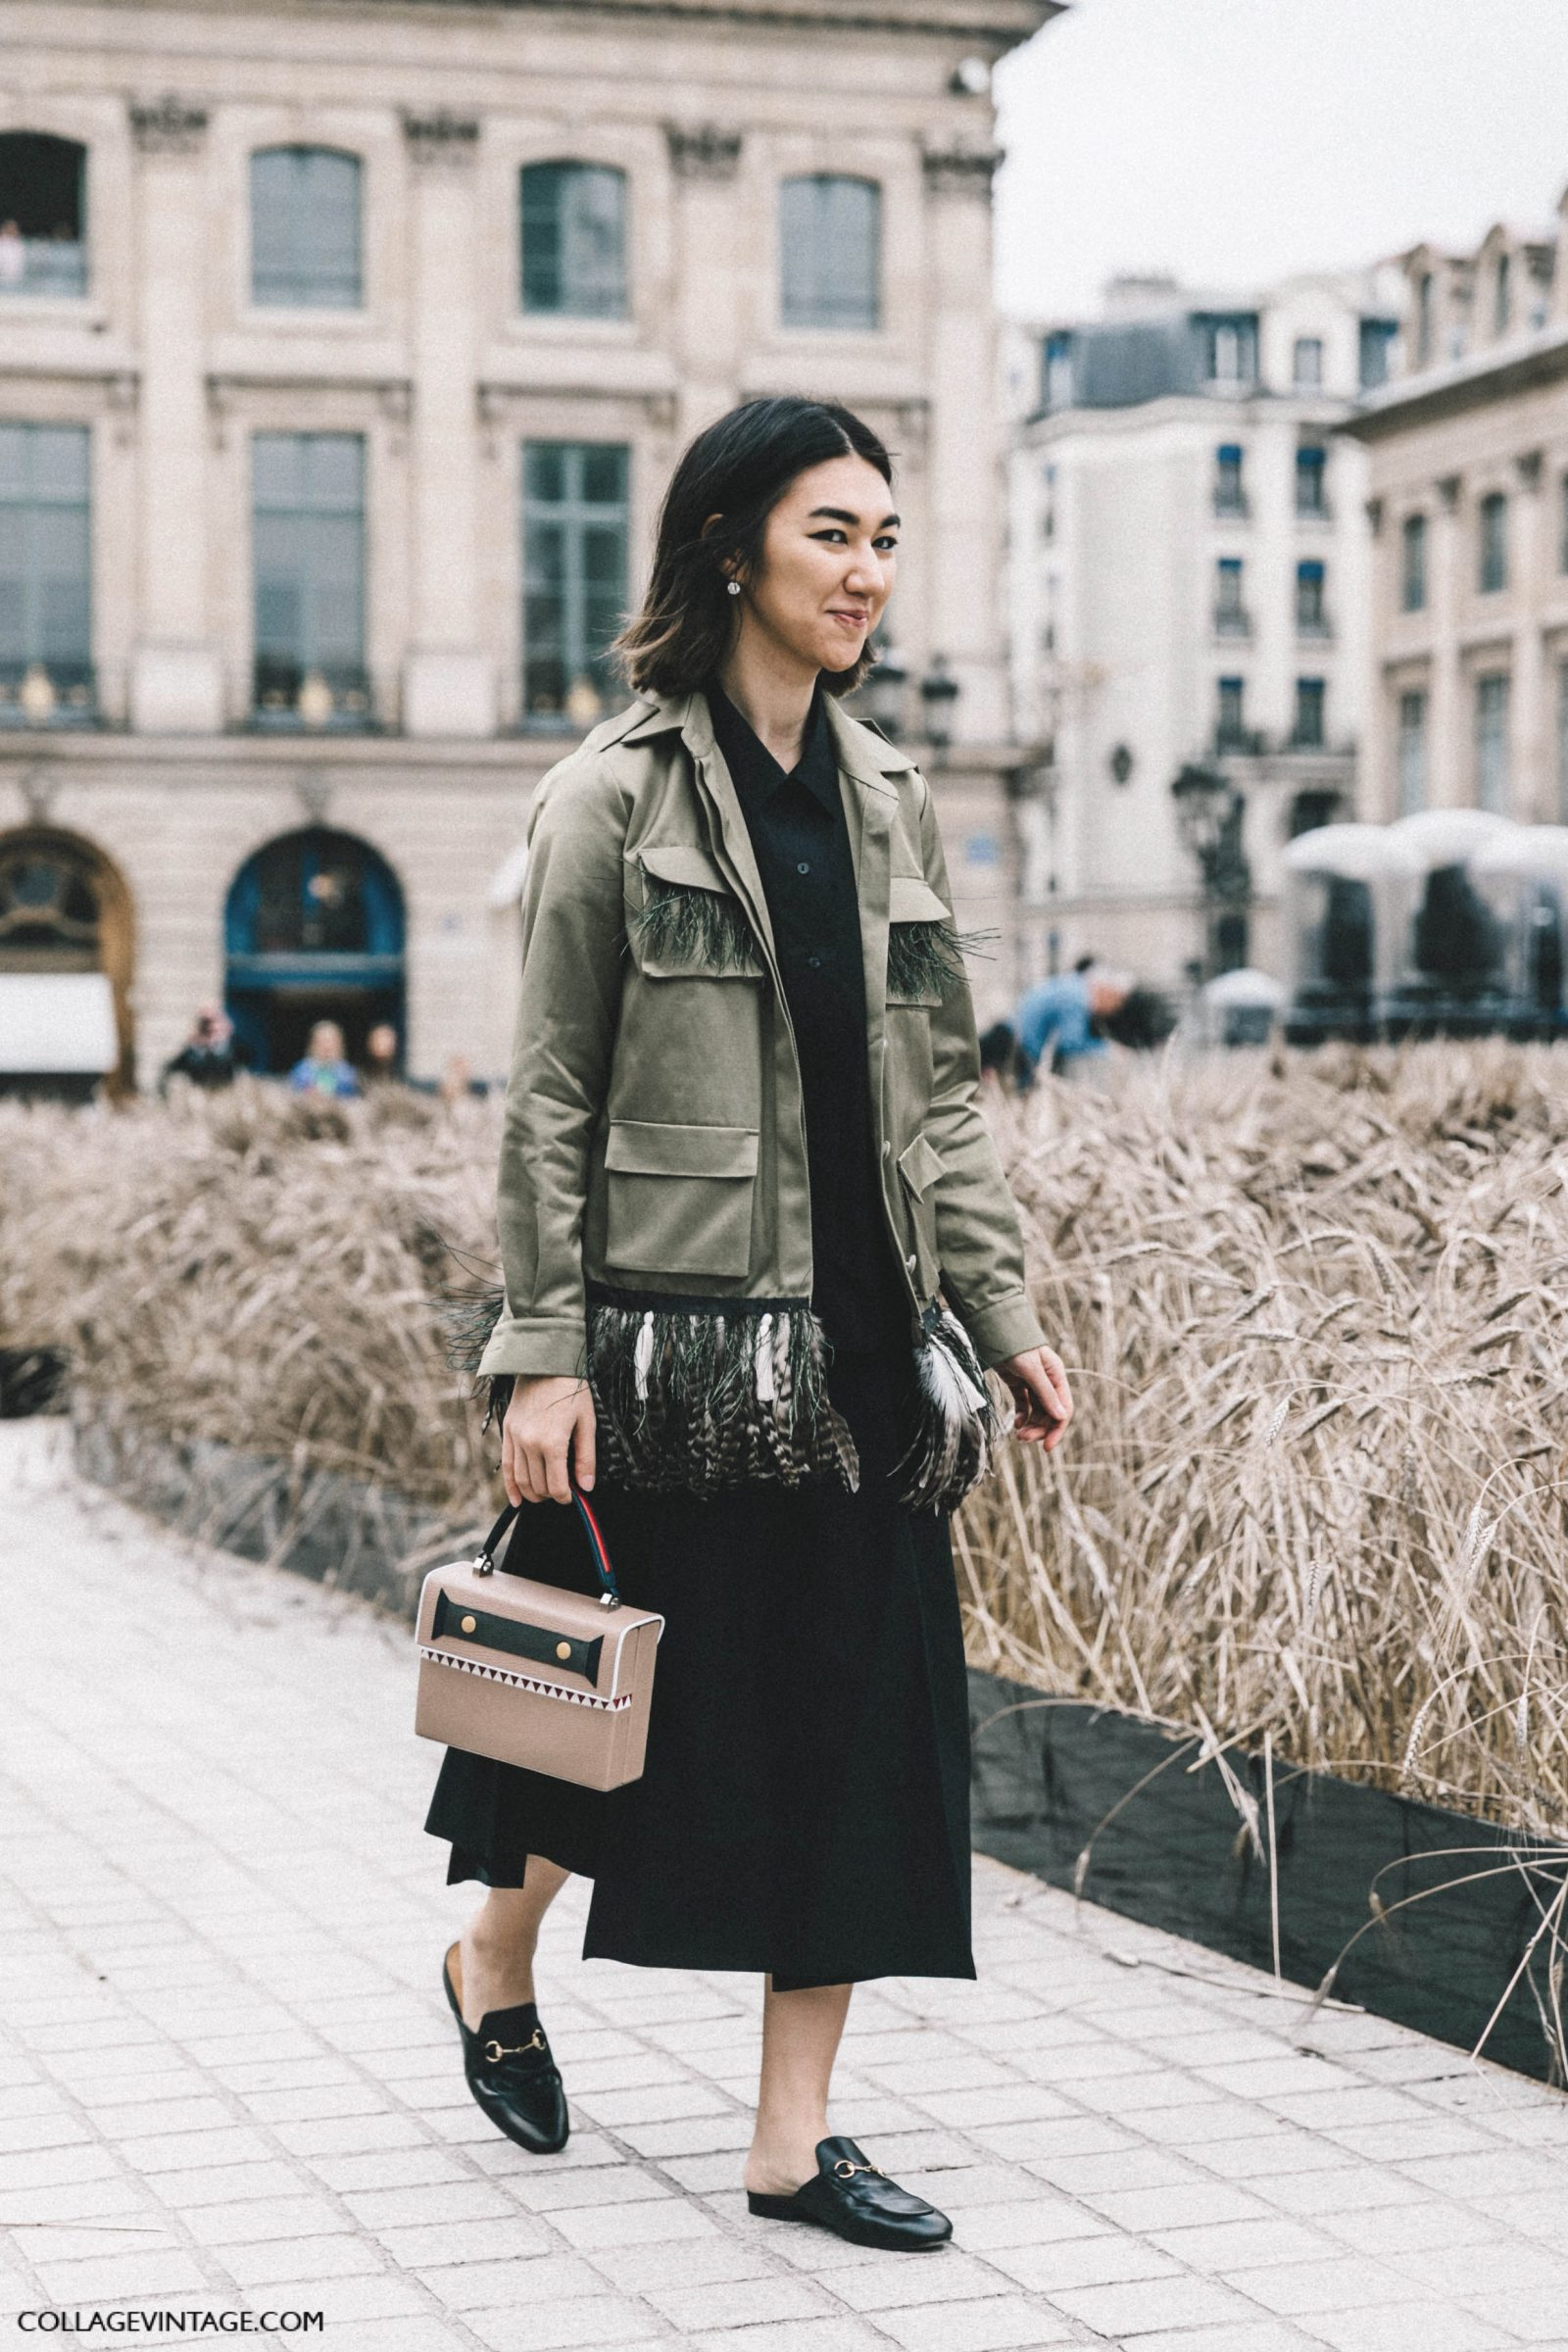 Paris_Couture_Fashion_Week-Collage_Vintage-Street_Style-17